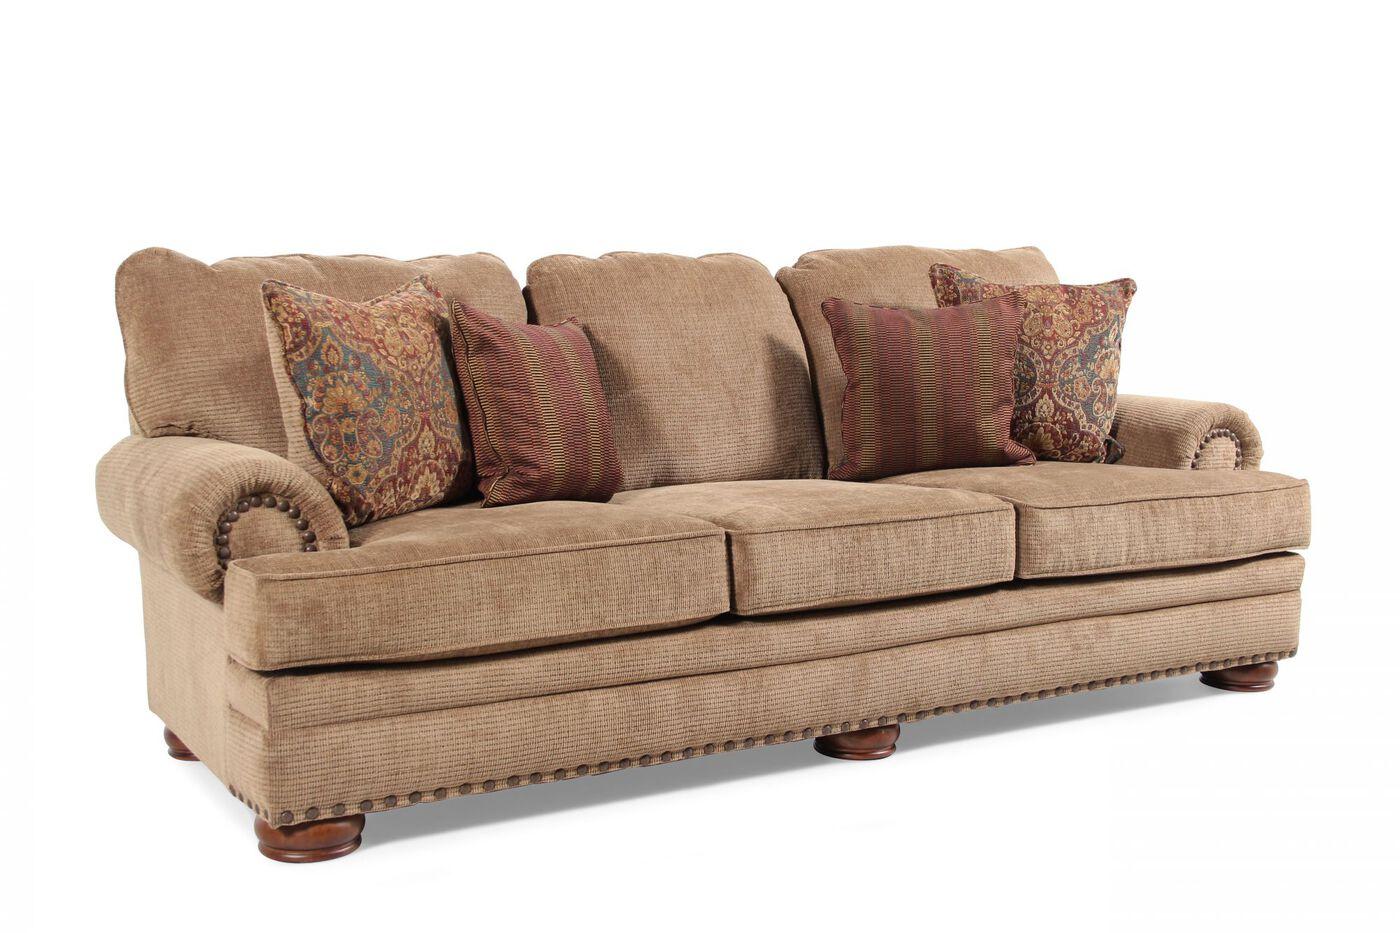 Nailhead Accented 101 Sofa In Desert Brown